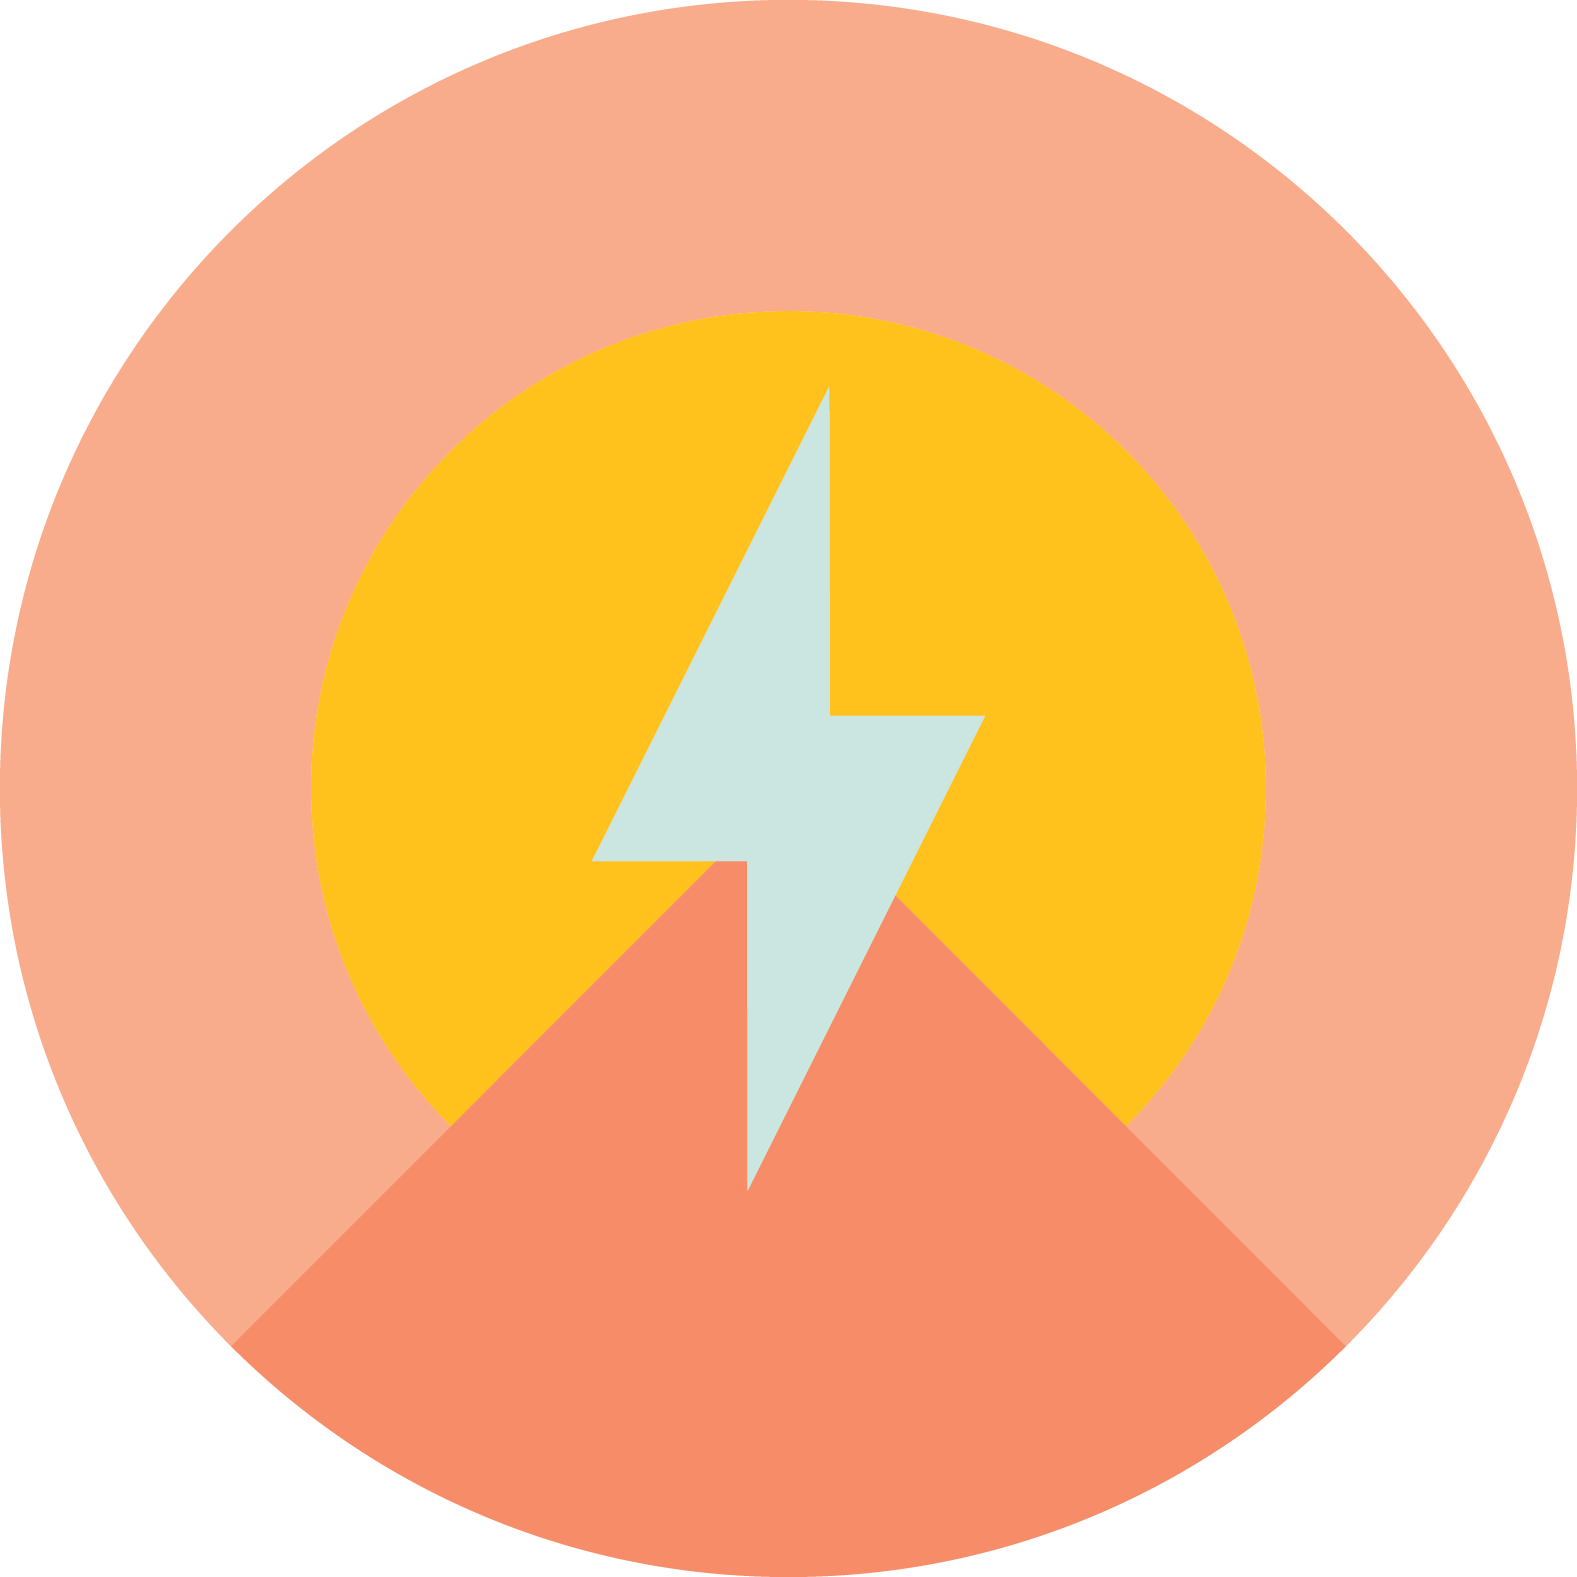 Solcellskollens logotyp